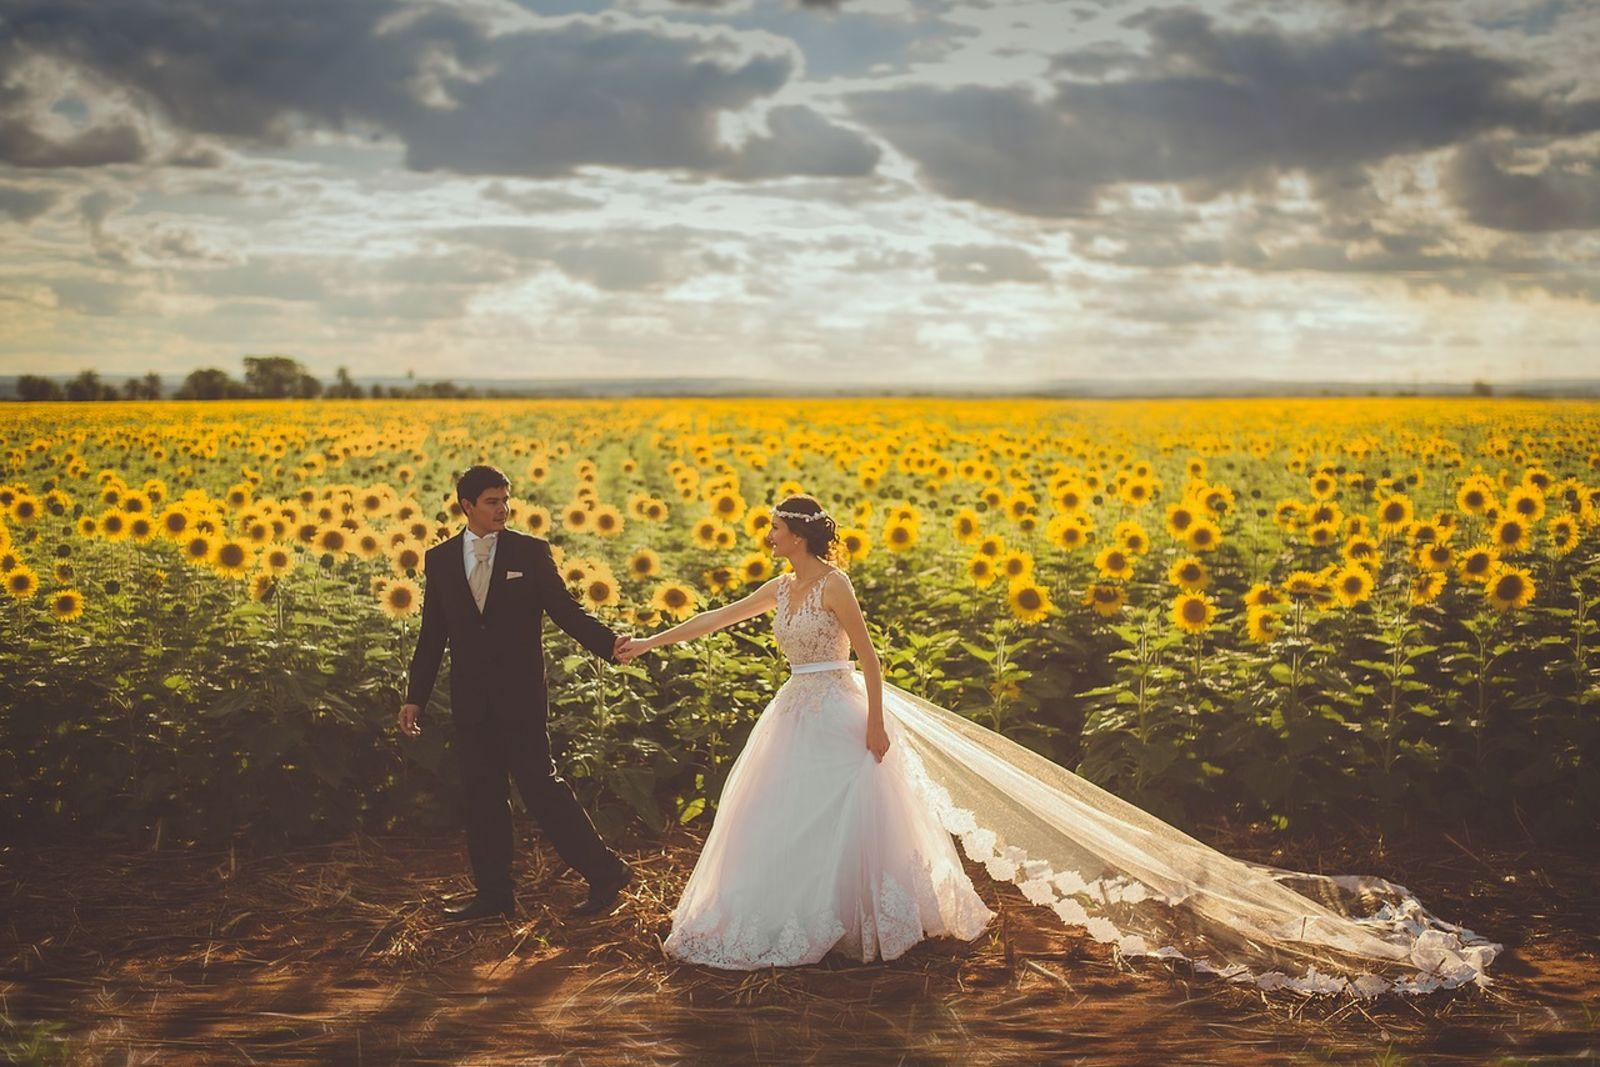 outdoor ceremony - wedding celebrant Bristol